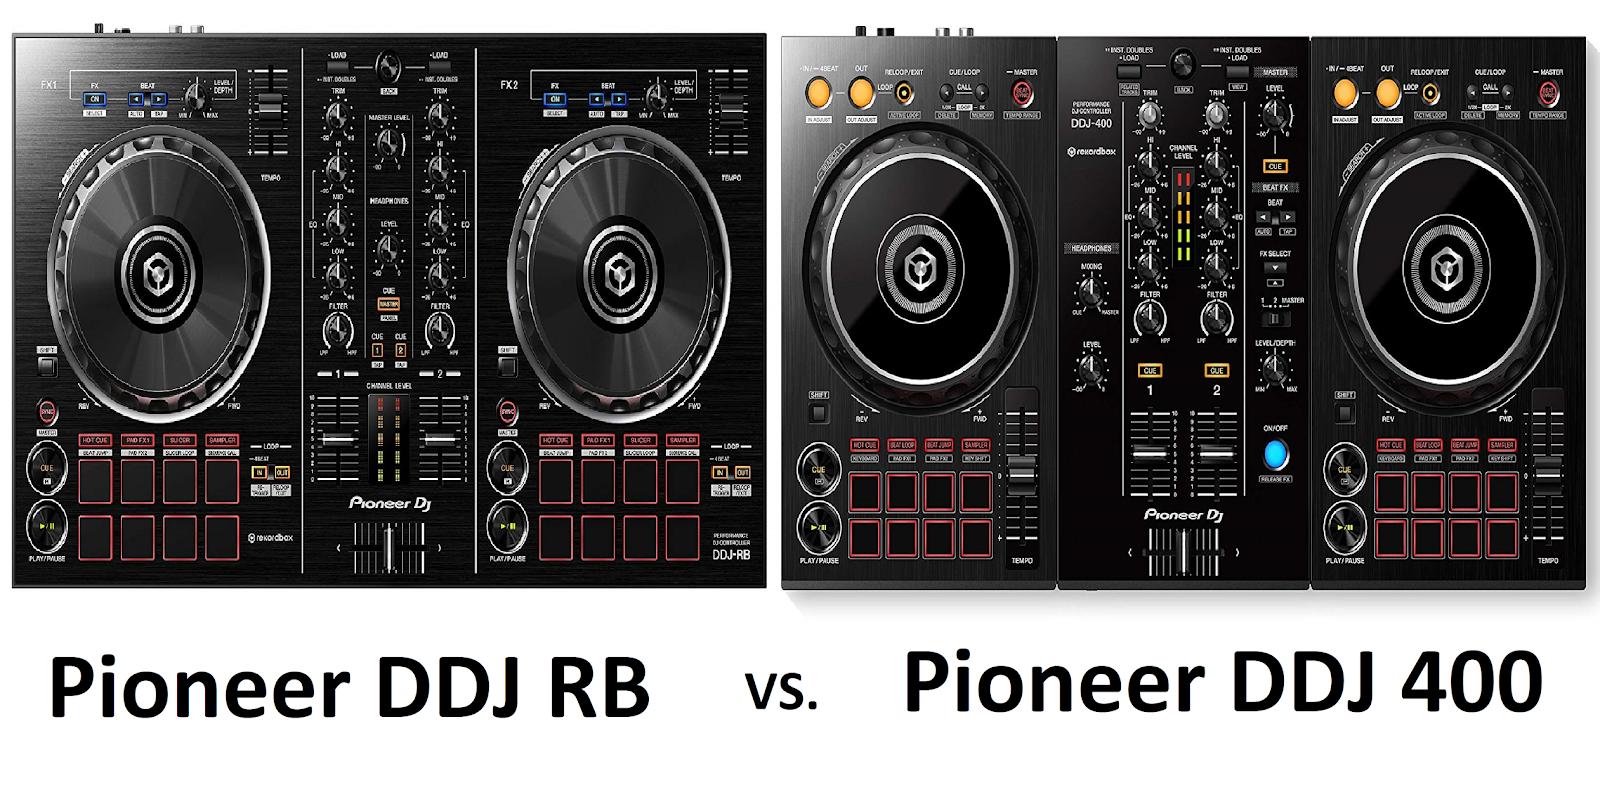 djtechworld com I DJ Tips, Tricks, Best DJ equipment to buy and much